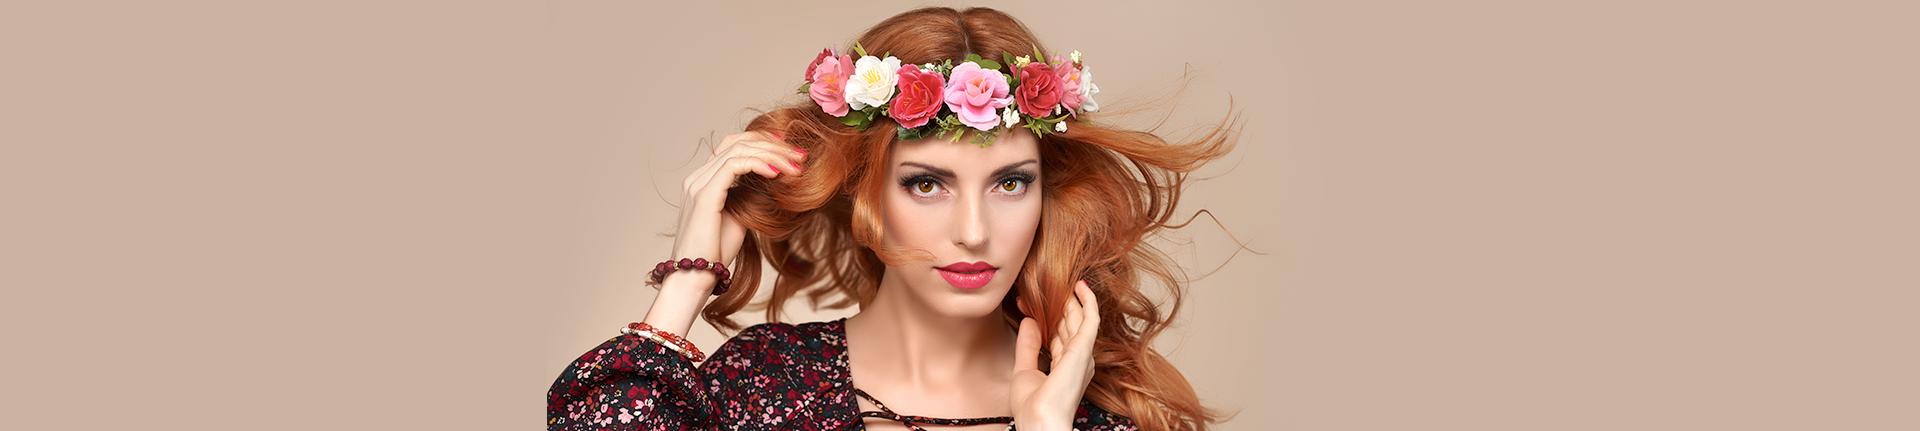 Moda histórica: coroas e guirlandas de flores